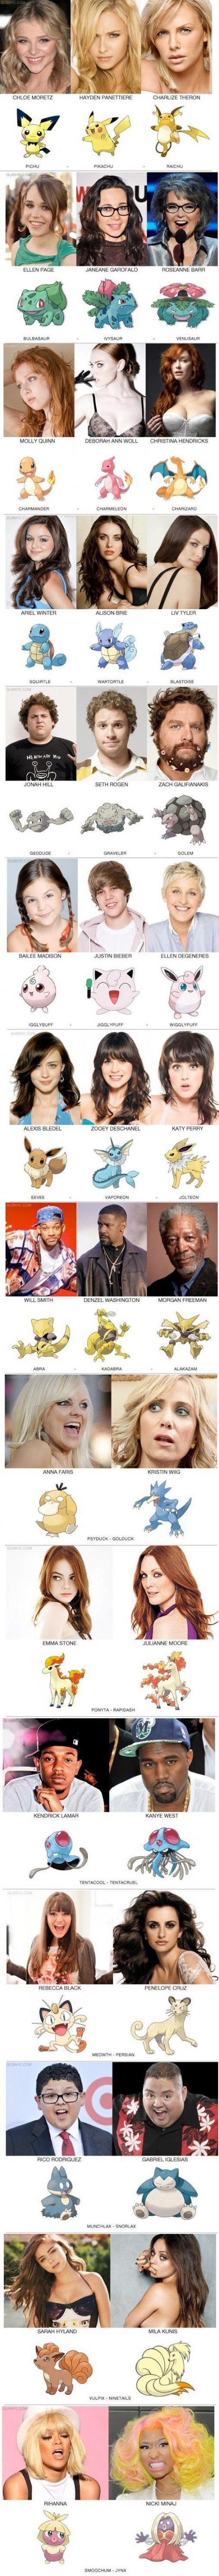 Celebrities and their Pokemon